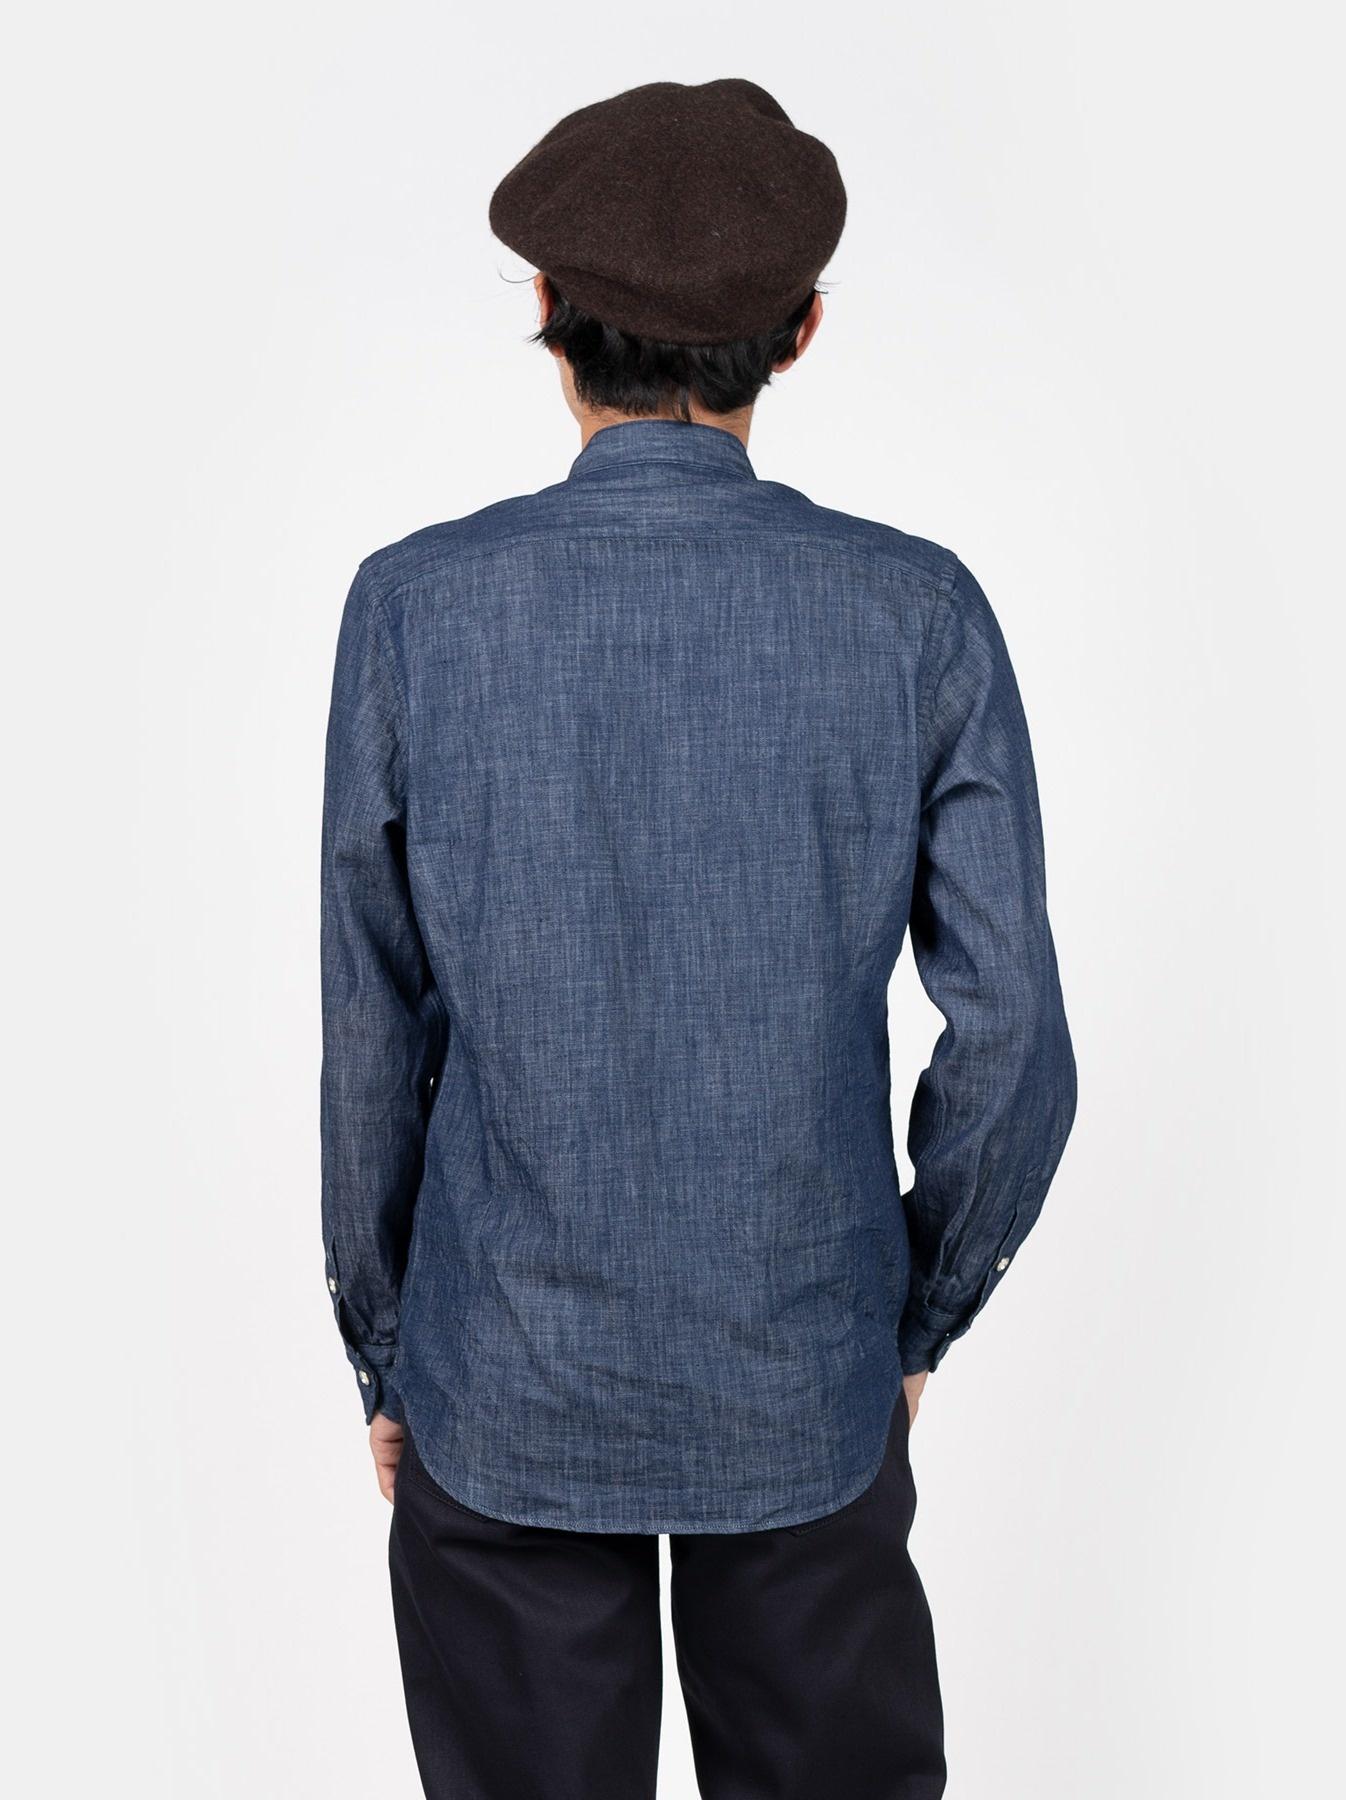 Goma Denim Stand Collar Eastern Shirt-5